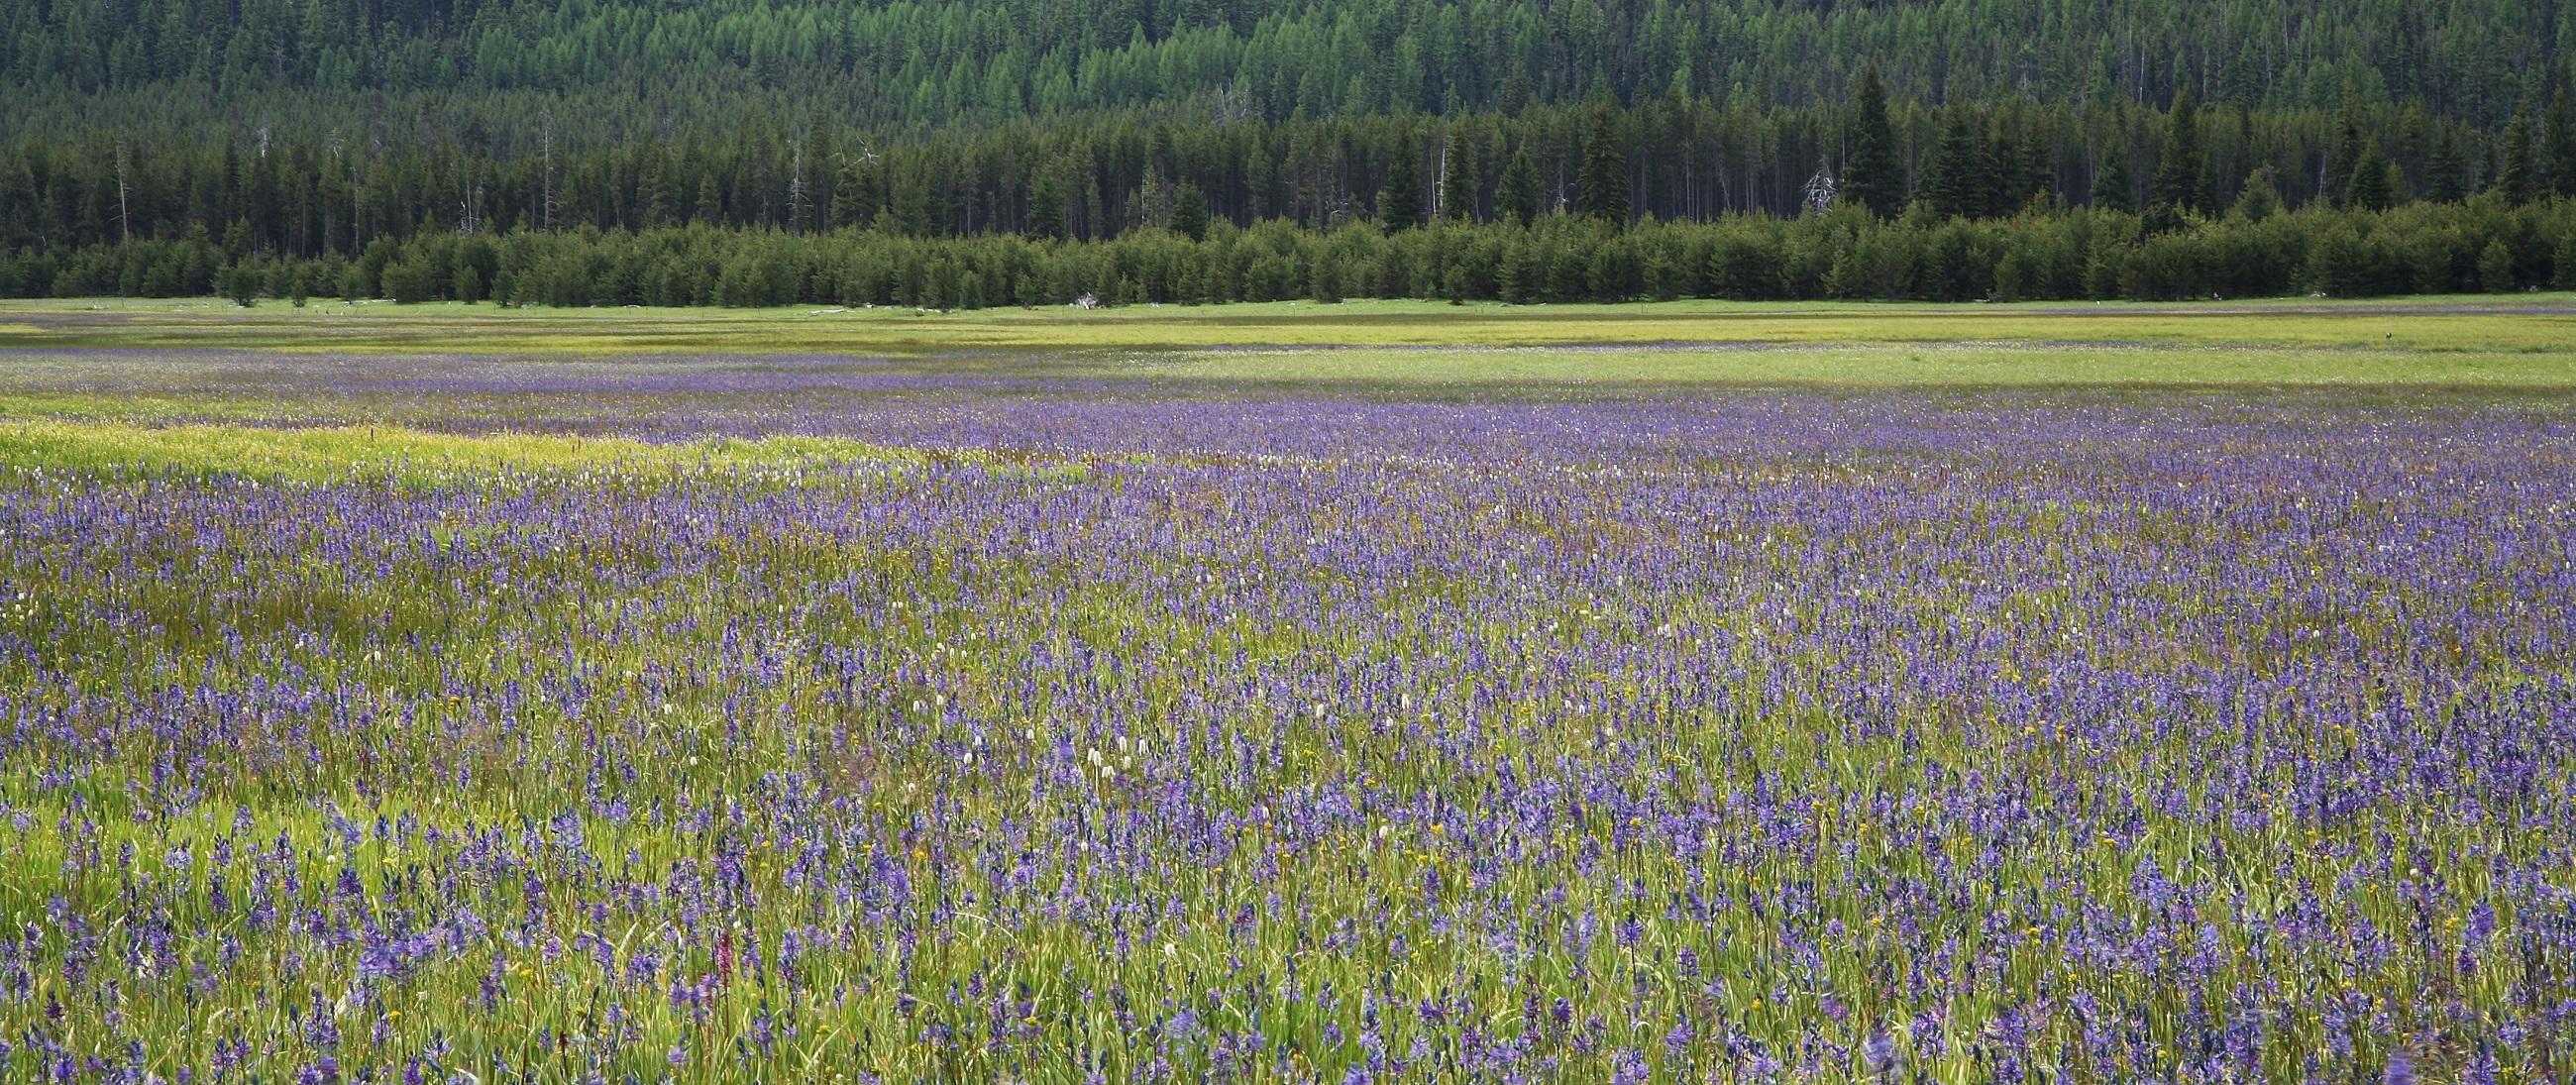 Flowers Field, Blooming, Flower, Fragrance, Fresh, HQ Photo